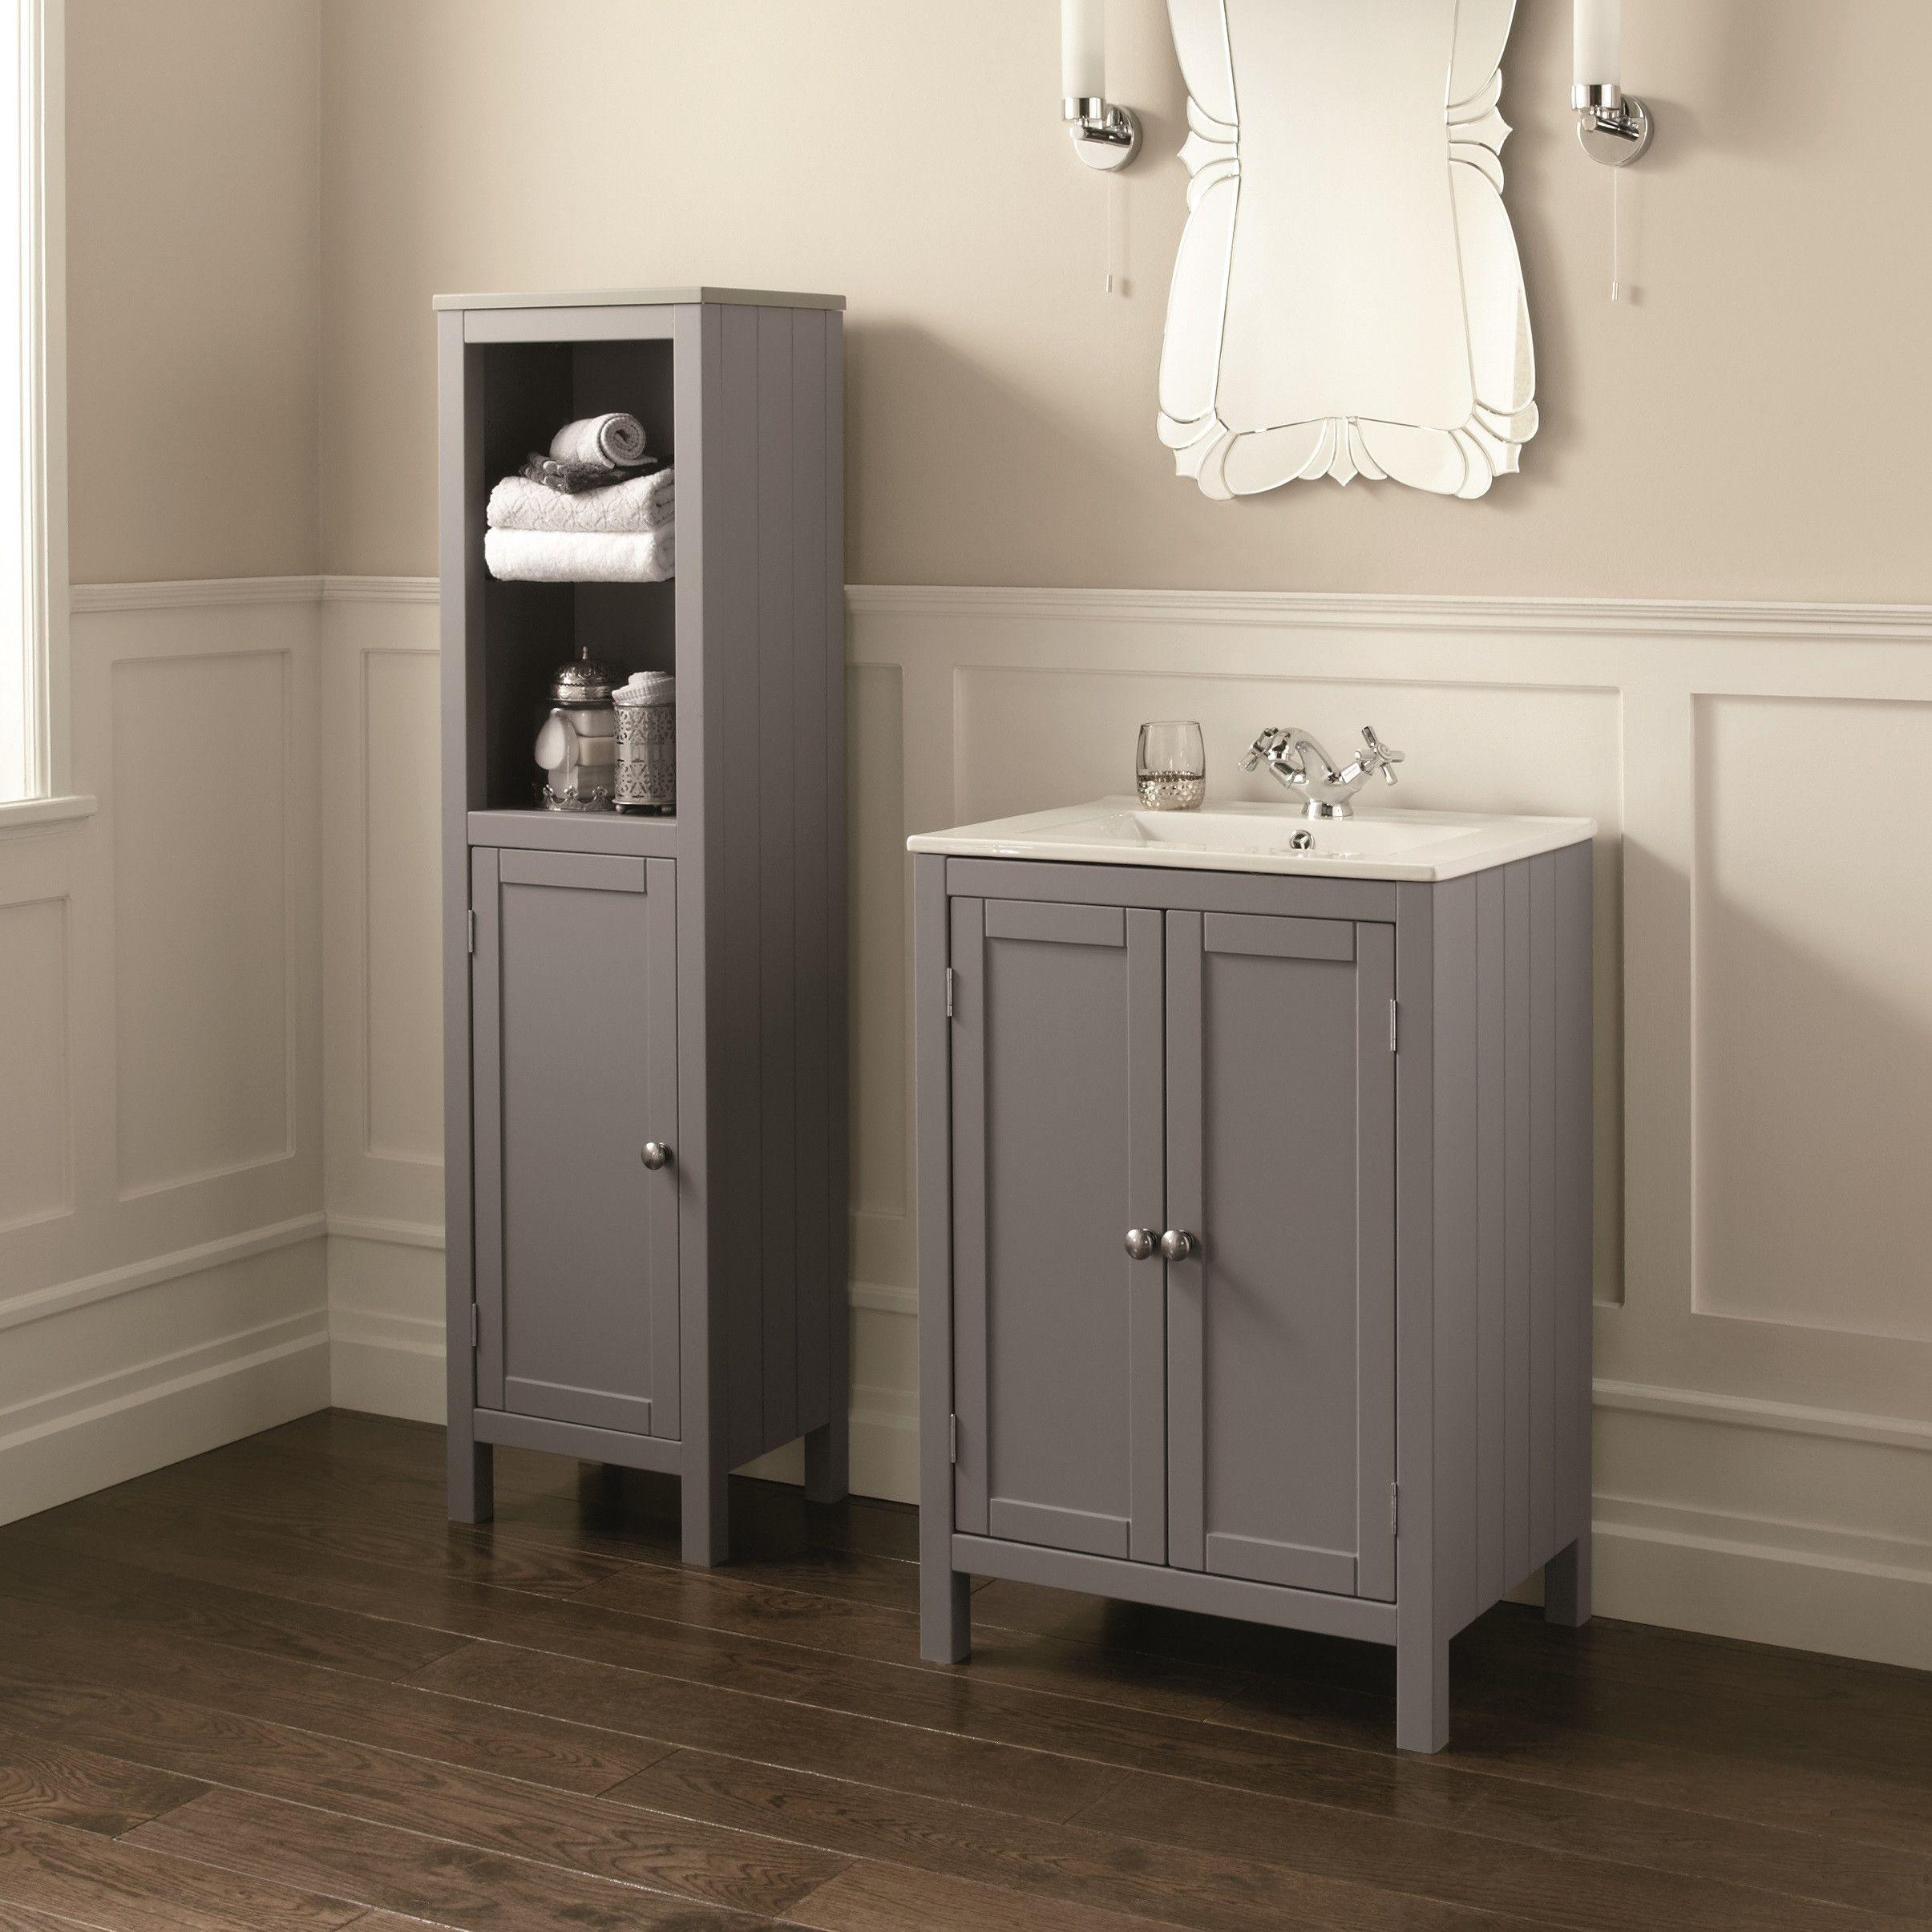 potential floor color | Cabin bath remodel | Pinterest | Vanity ...